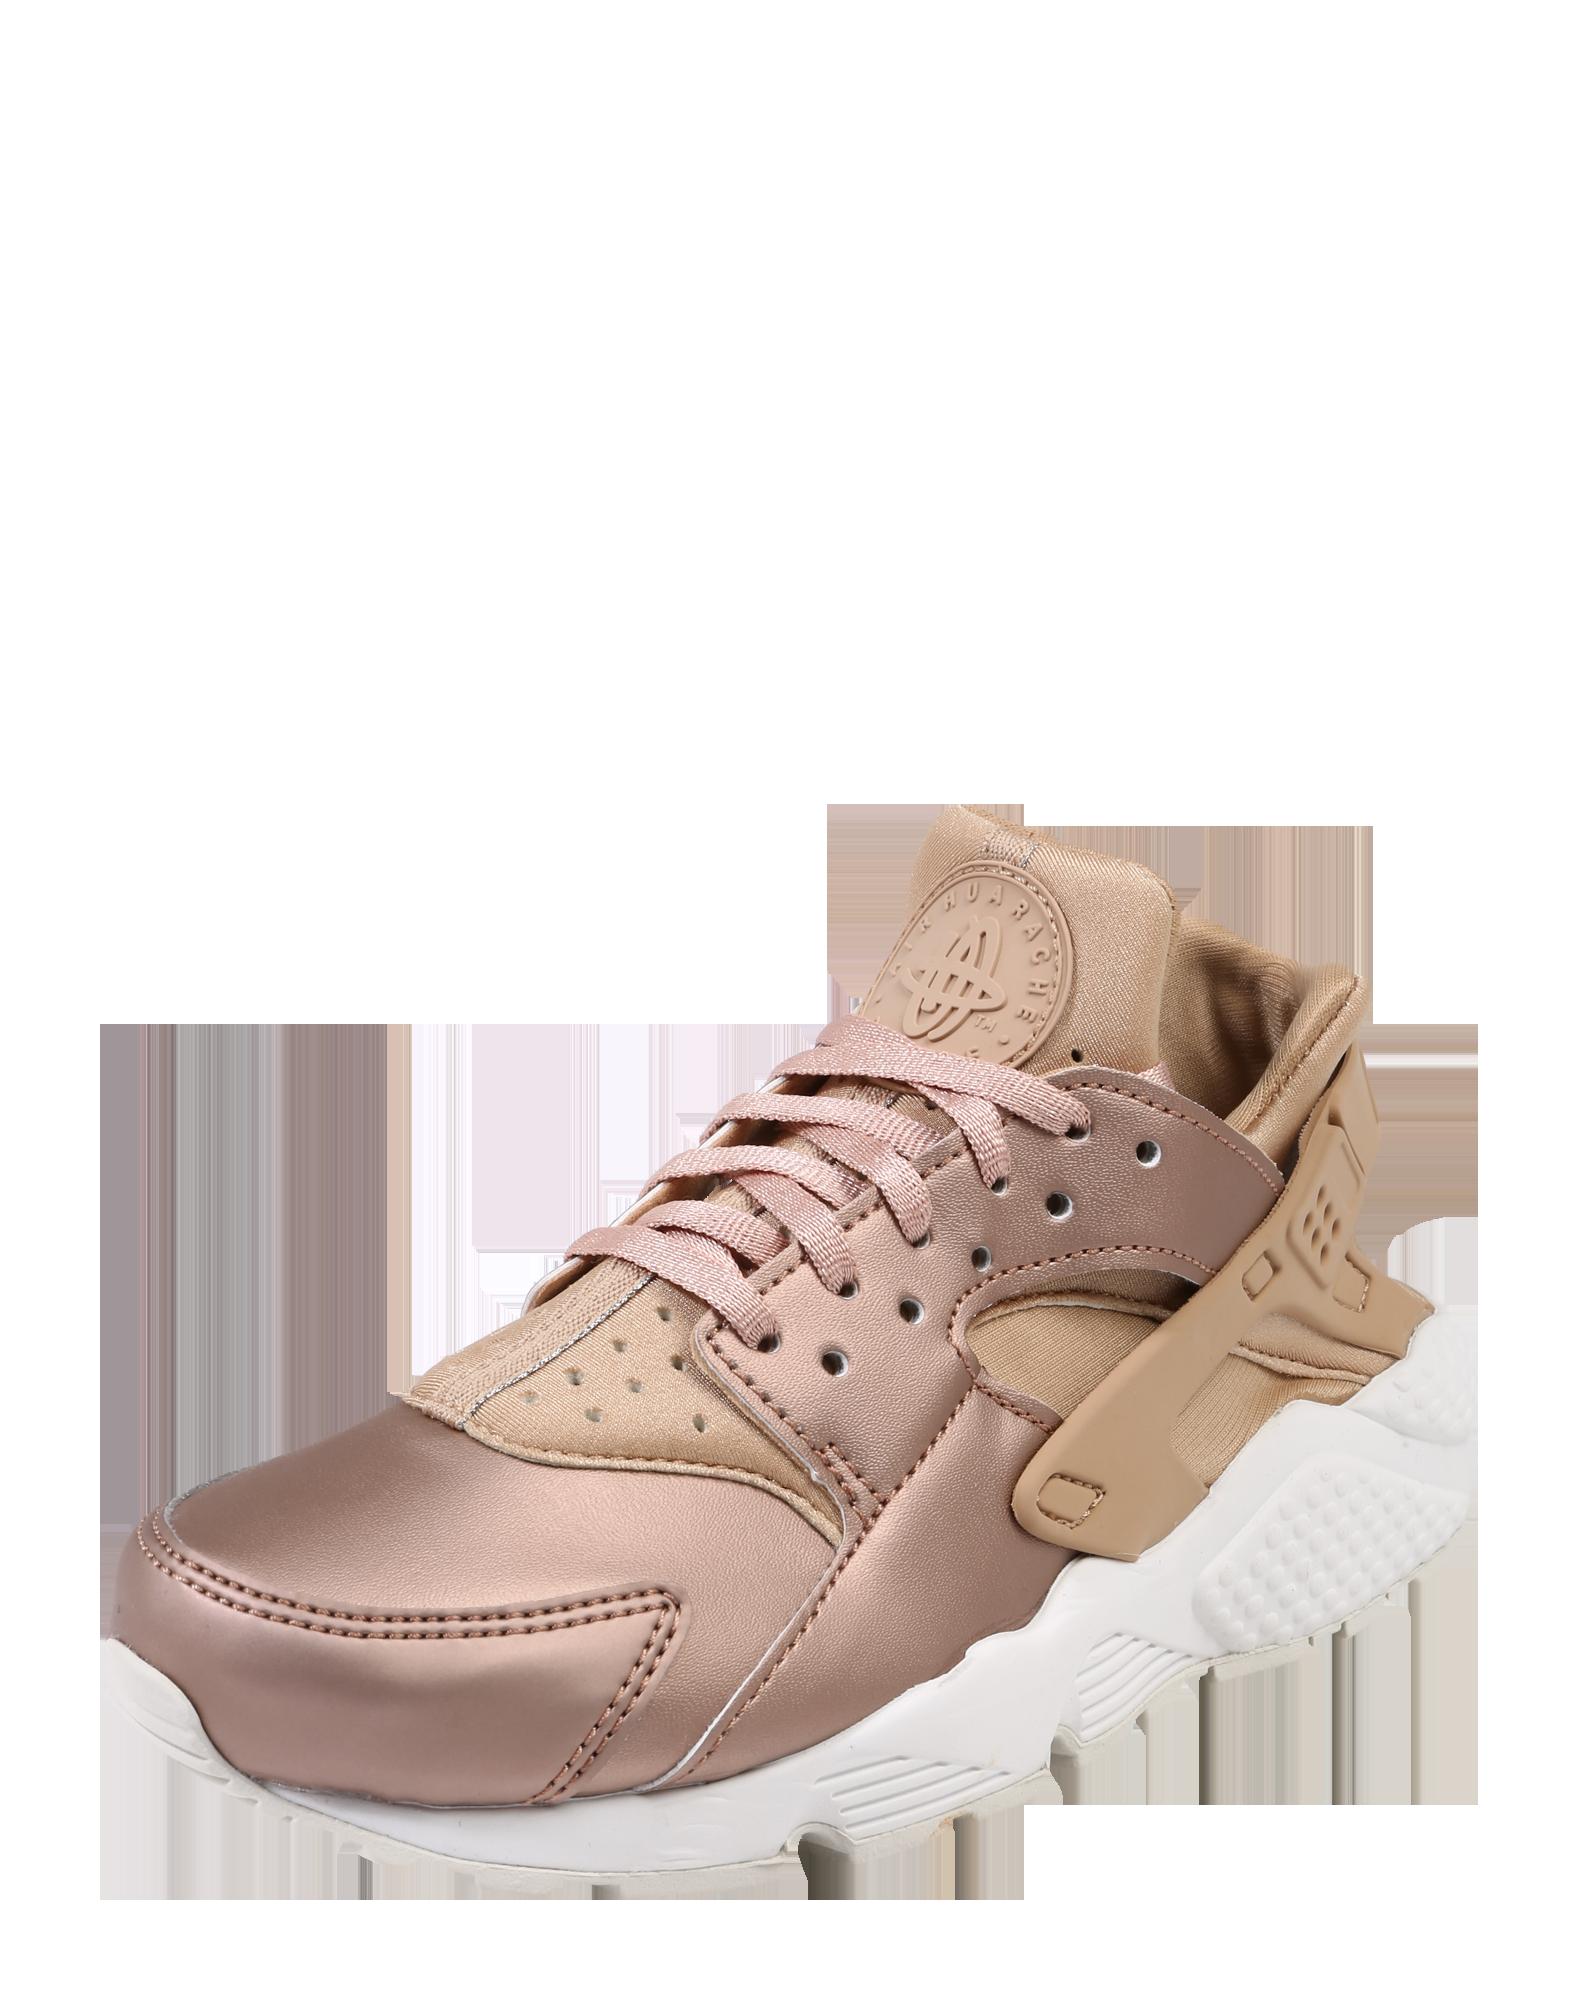 Sneakers laag 'Air Huarache Run' Winkelaanbod Online Te Koop Klaring Outlet Korting Officiele Site Goedkope Betaalbare fssMZ13XSa